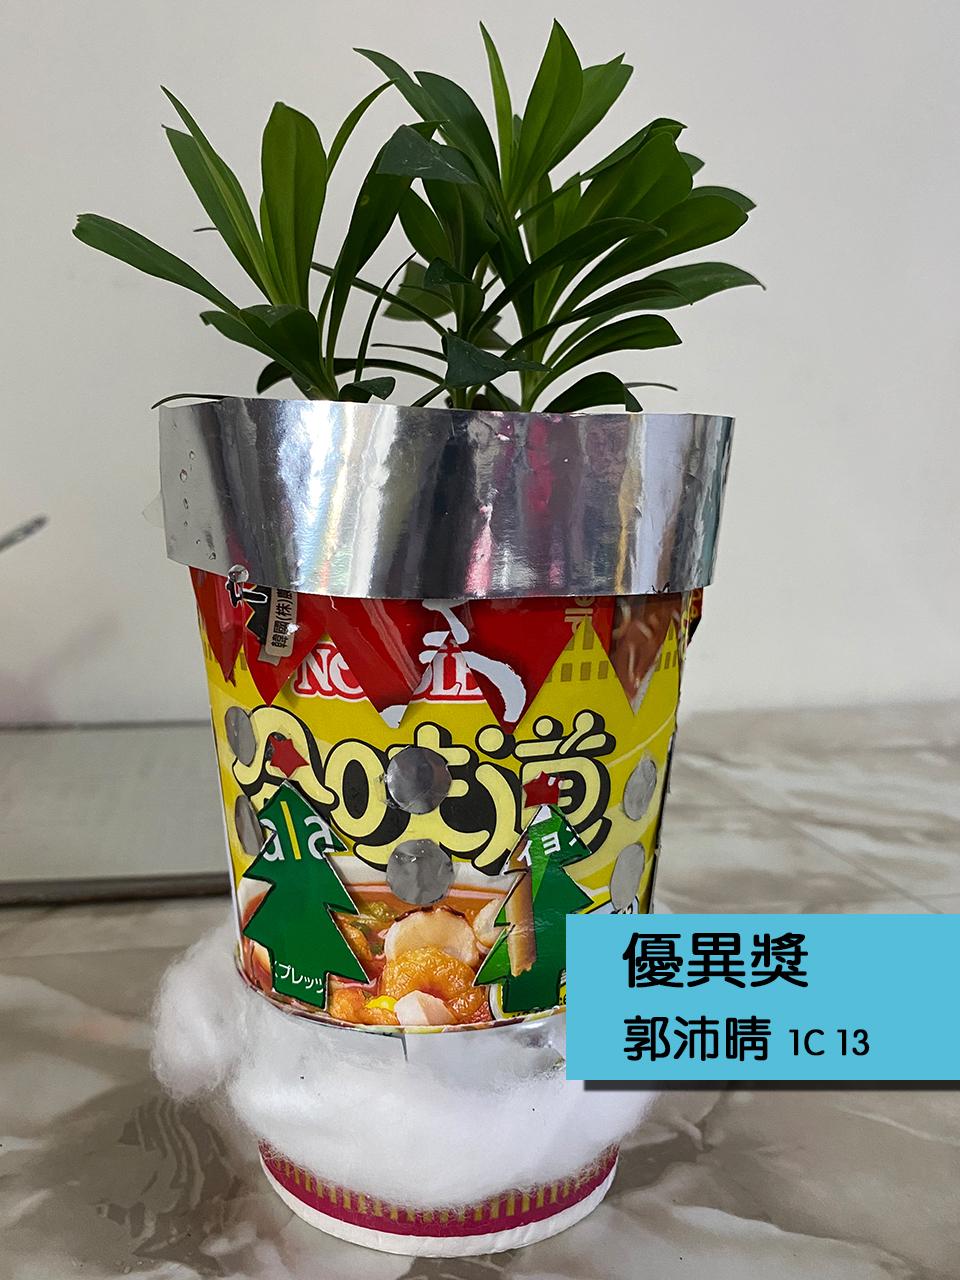 https://plkcjy.edu.hk/sites/default/files/you_yi_jiang_1c_13_guo_pei_qing_.jpg